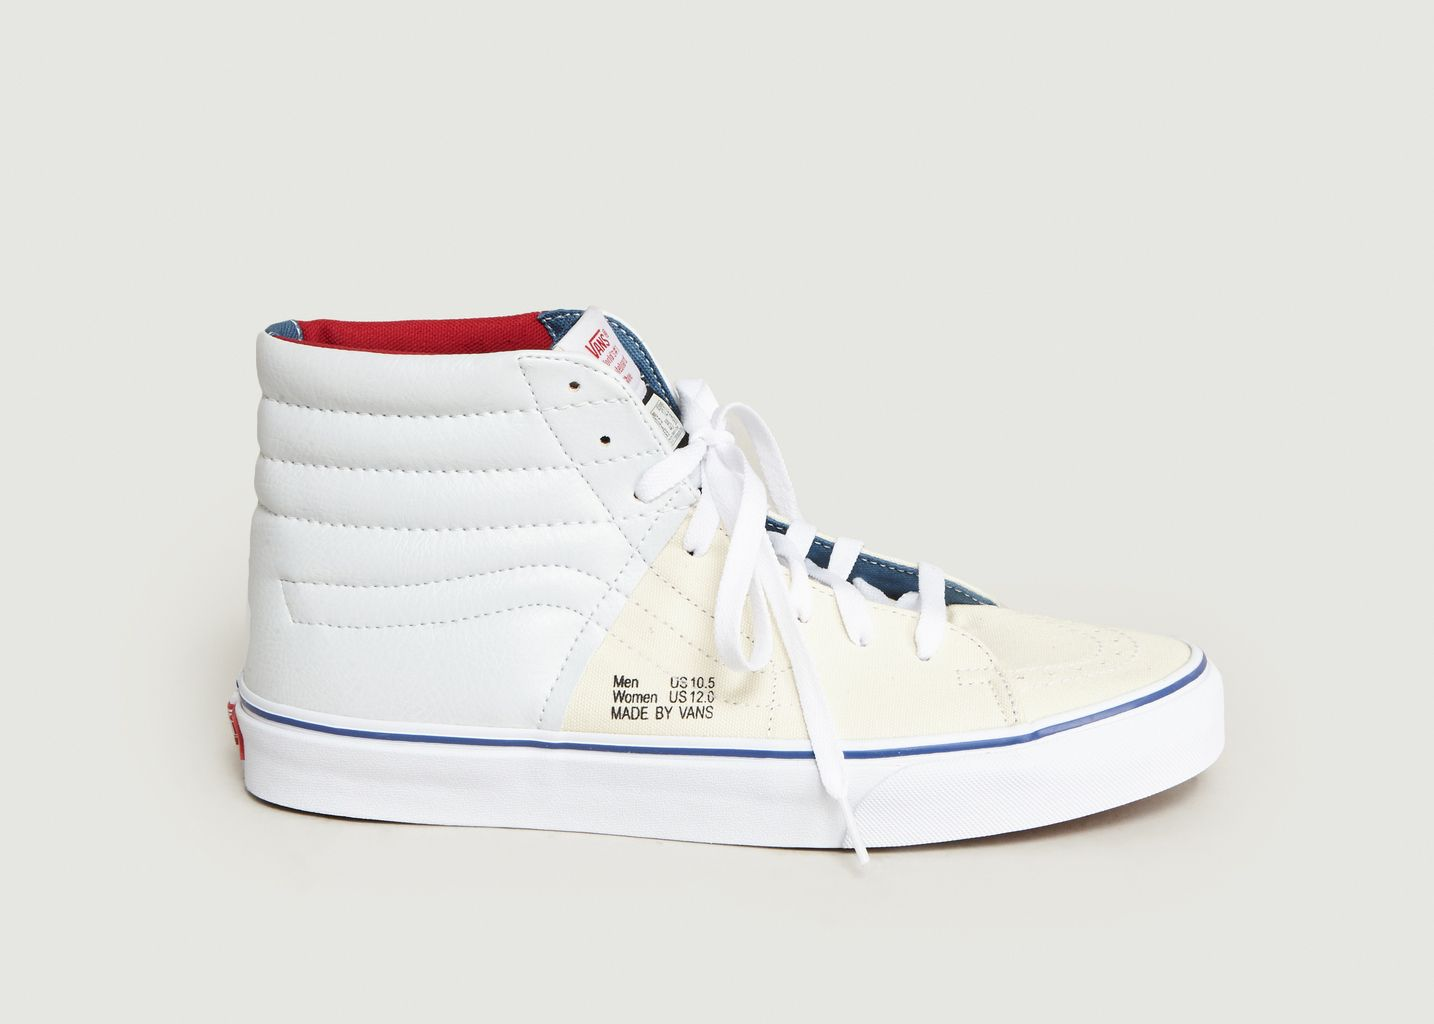 b61dc3dac8 Sneakers Outside SK8 High Ecru Vans